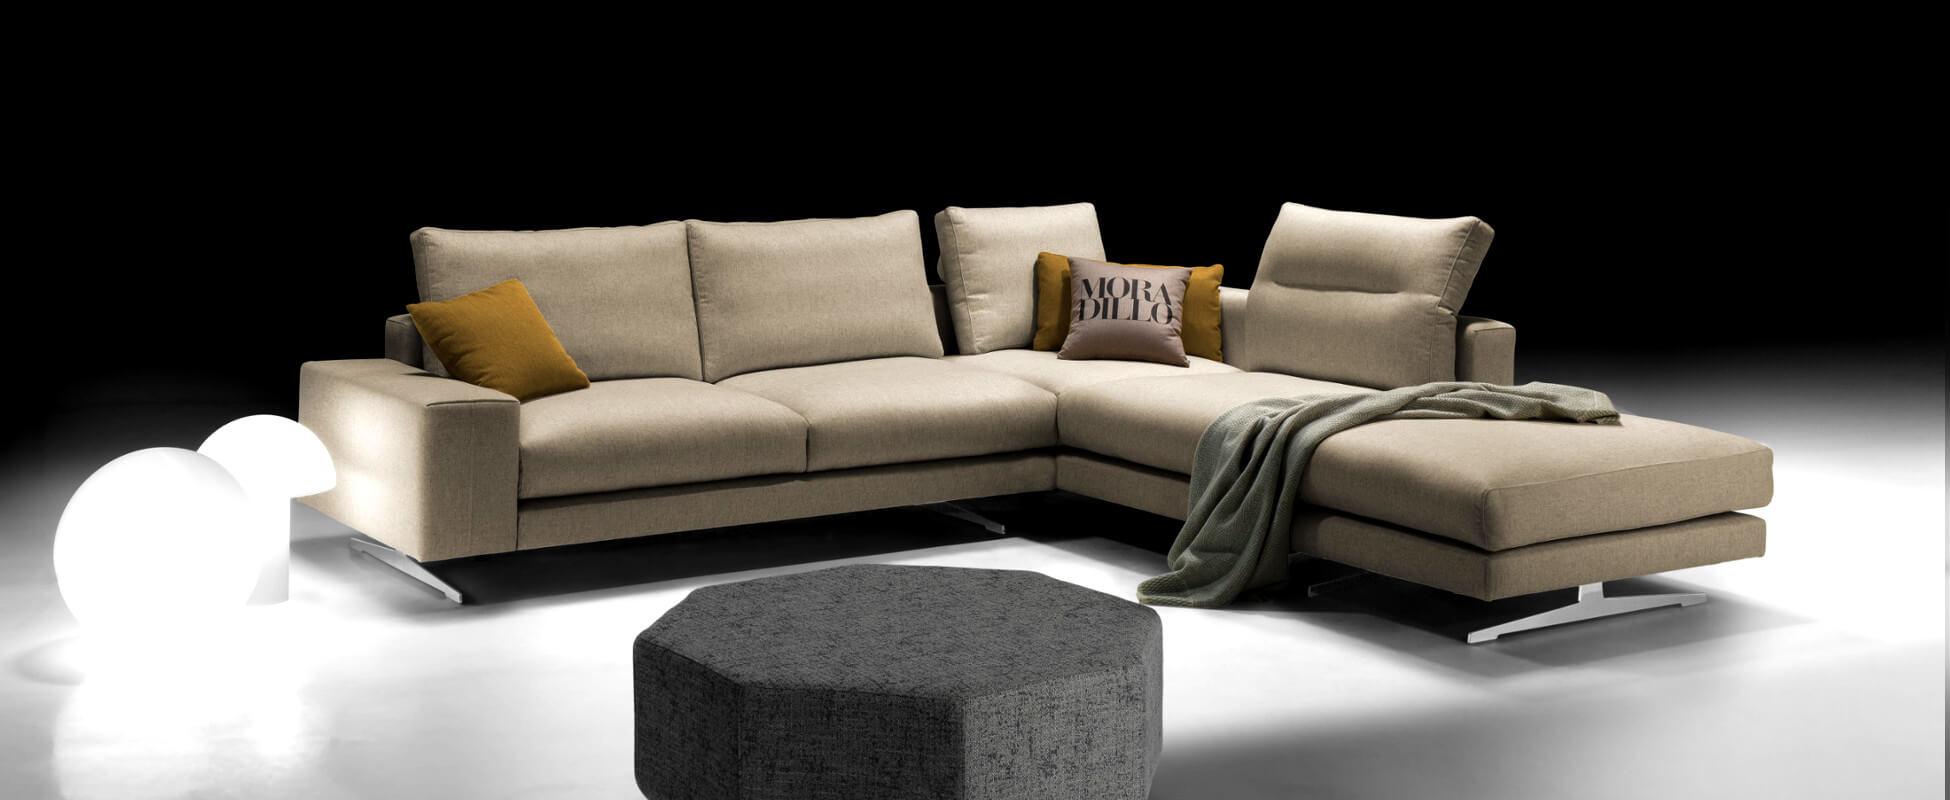 Sofa rinconera Poso